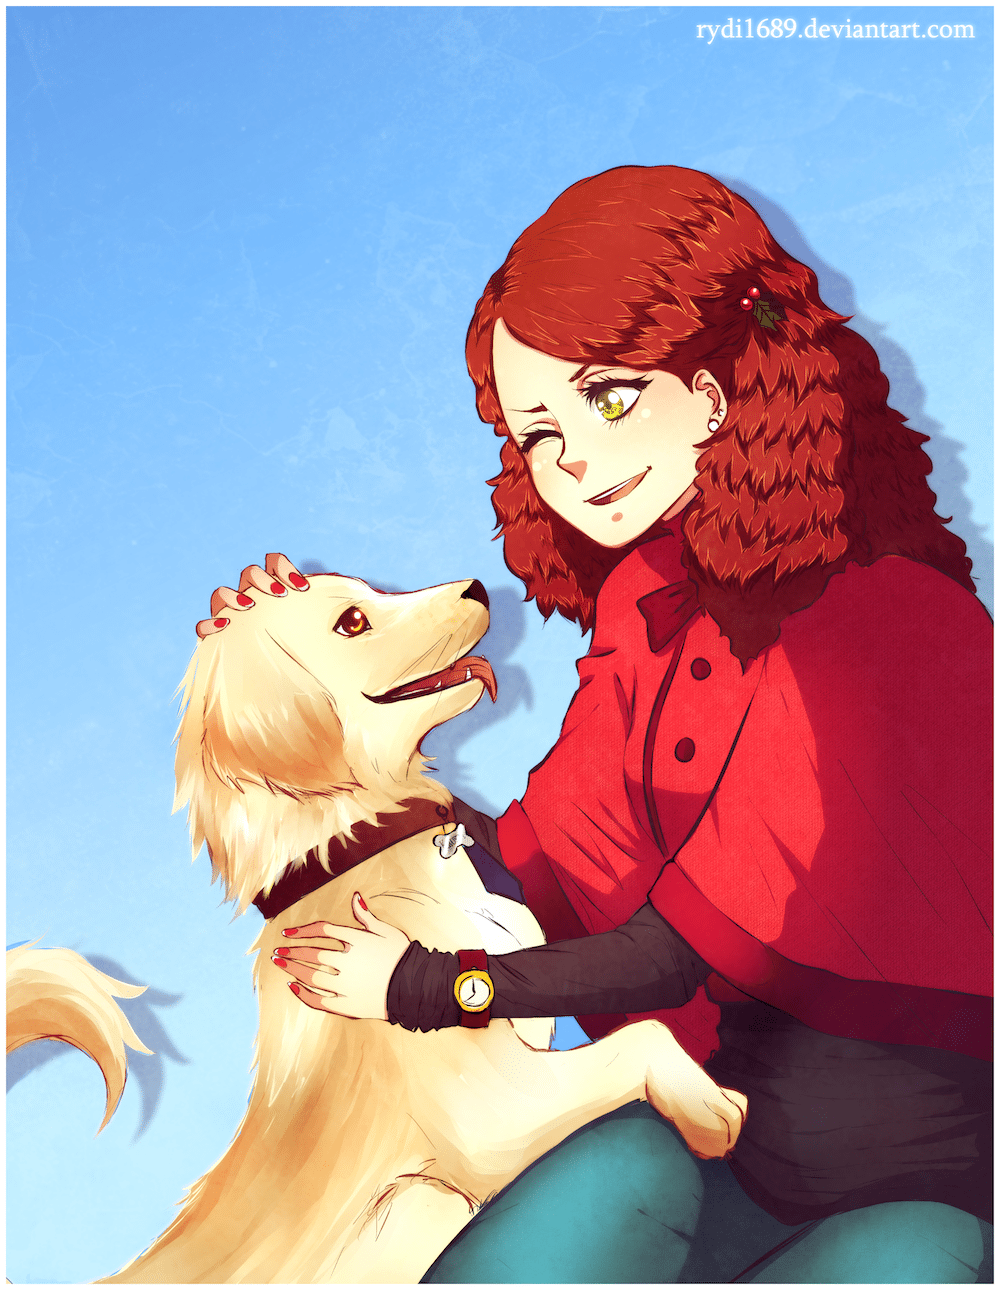 Portrait of Martha and her dog Krusty by Lucía García via ArtCorgi